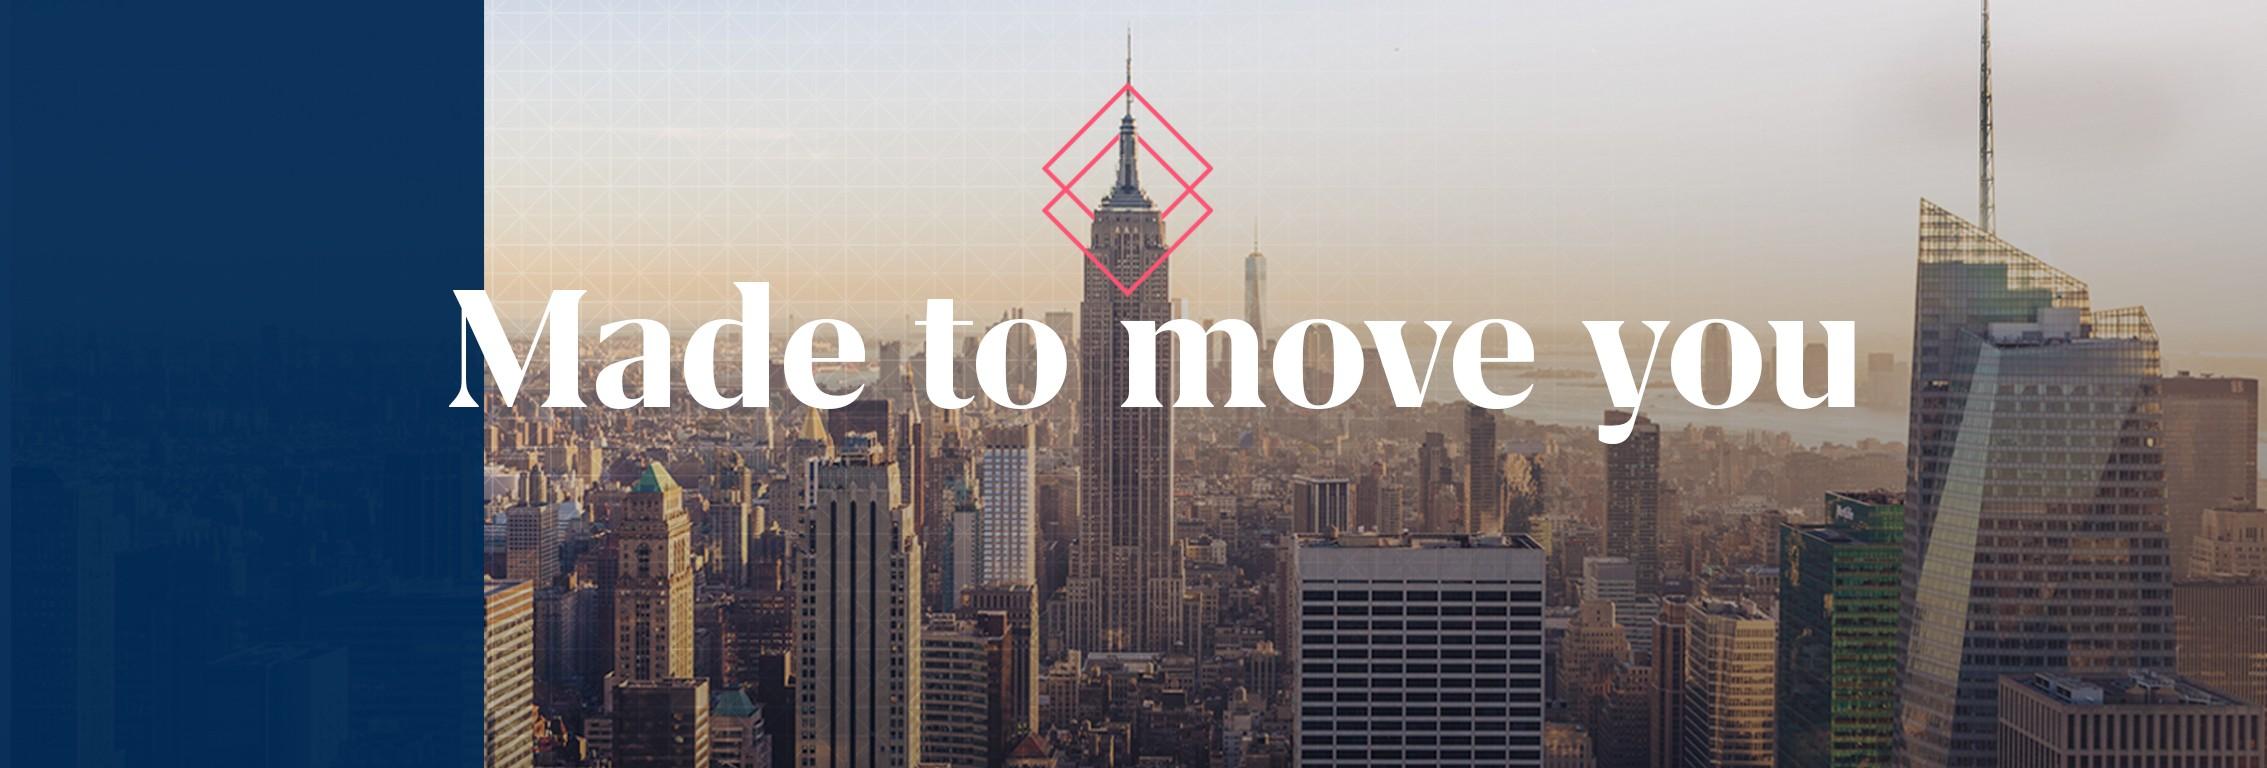 Otis Elevator Co : Jobs | LinkedIn